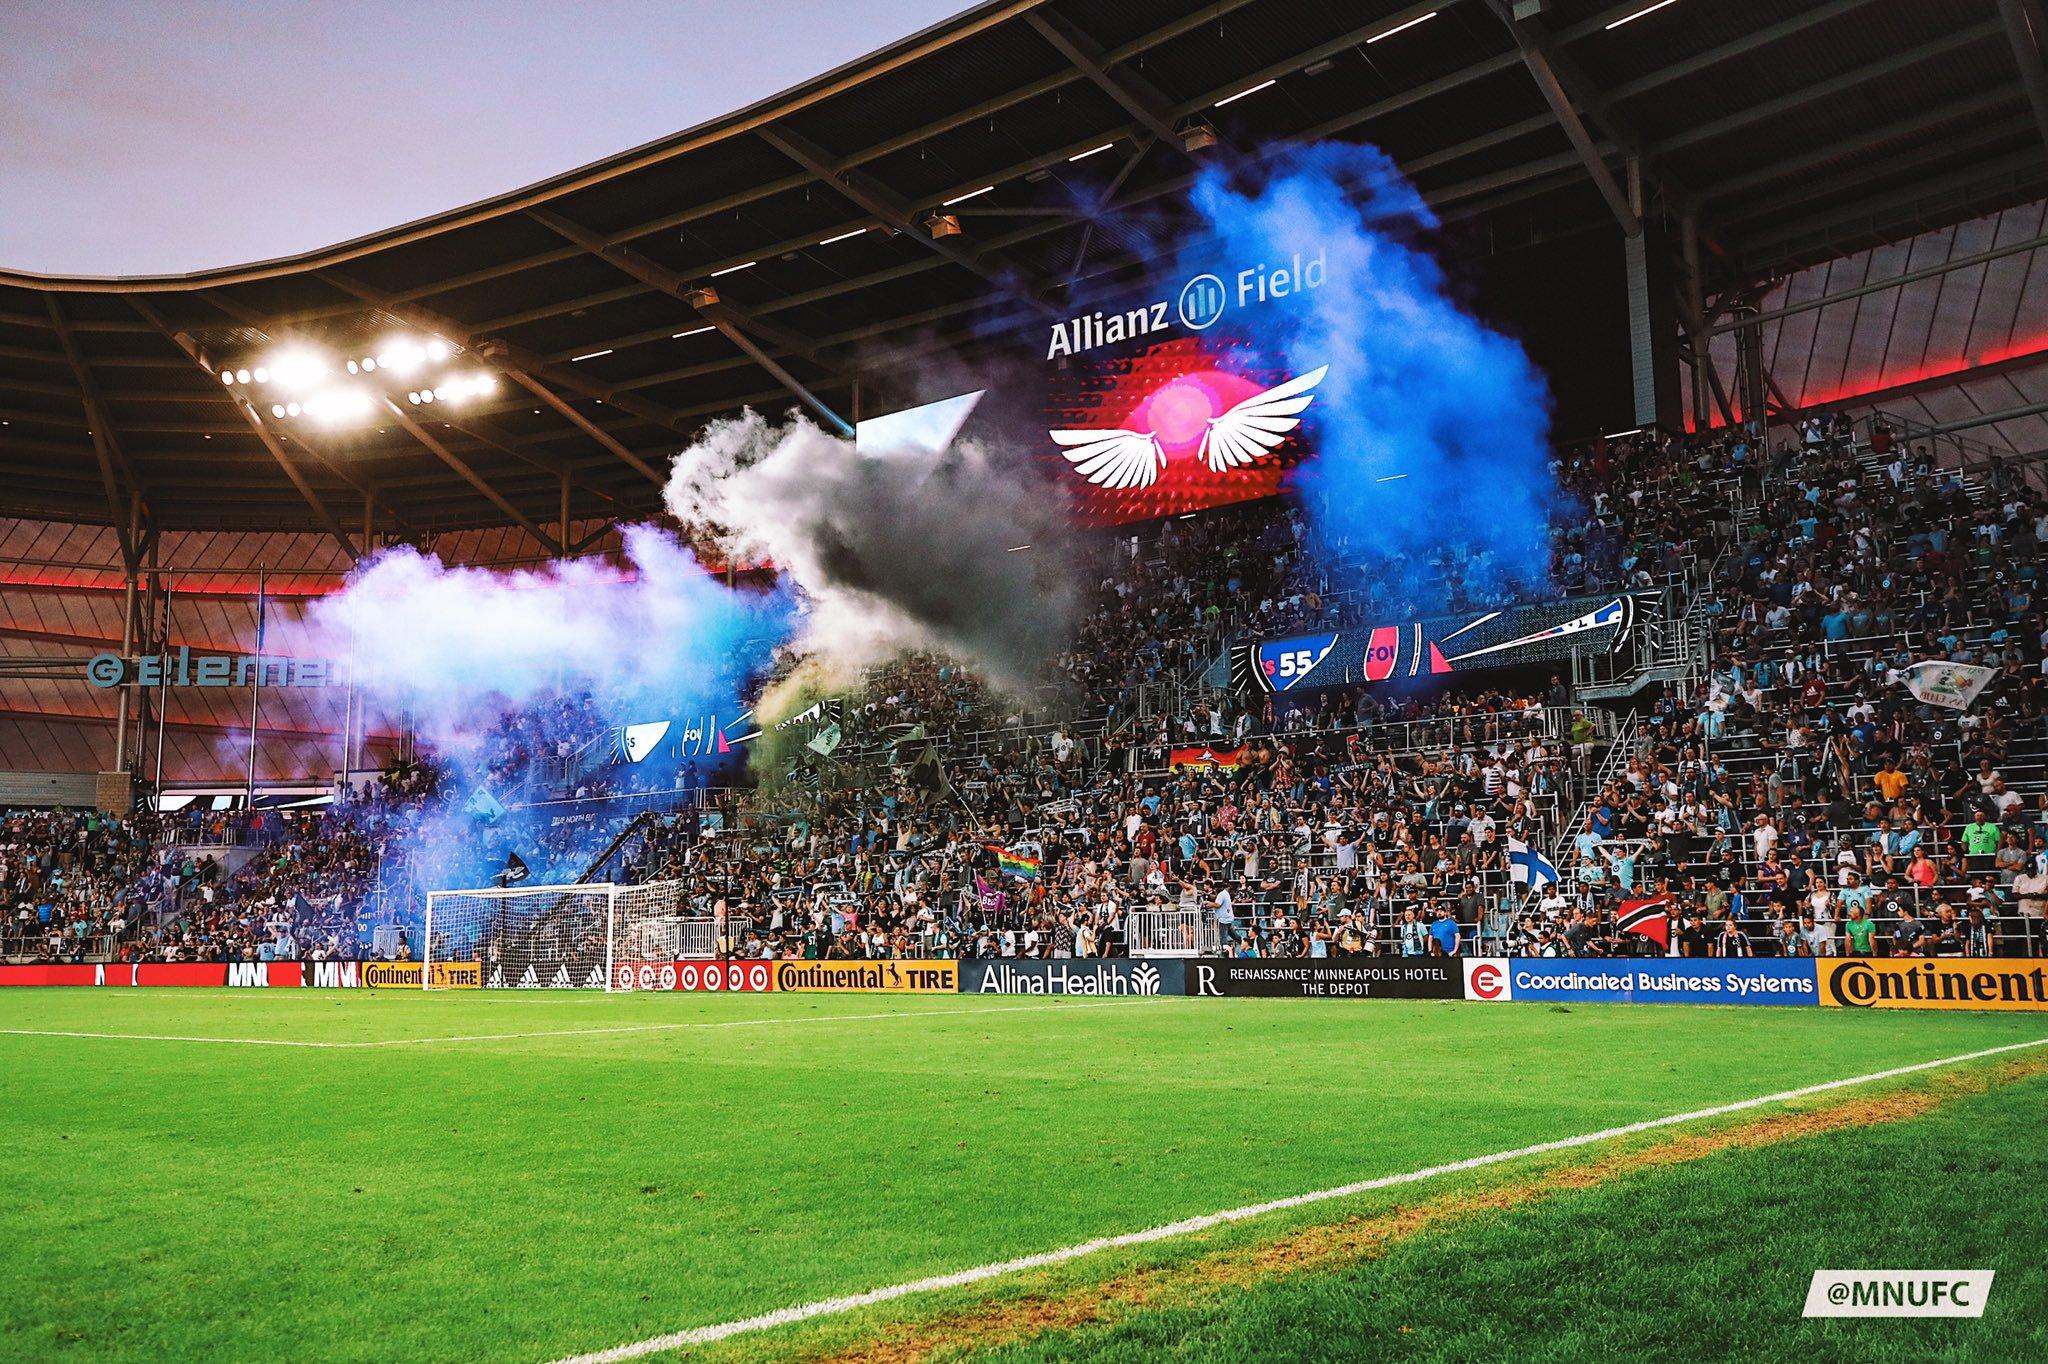 Allianz Field photo from Twitter